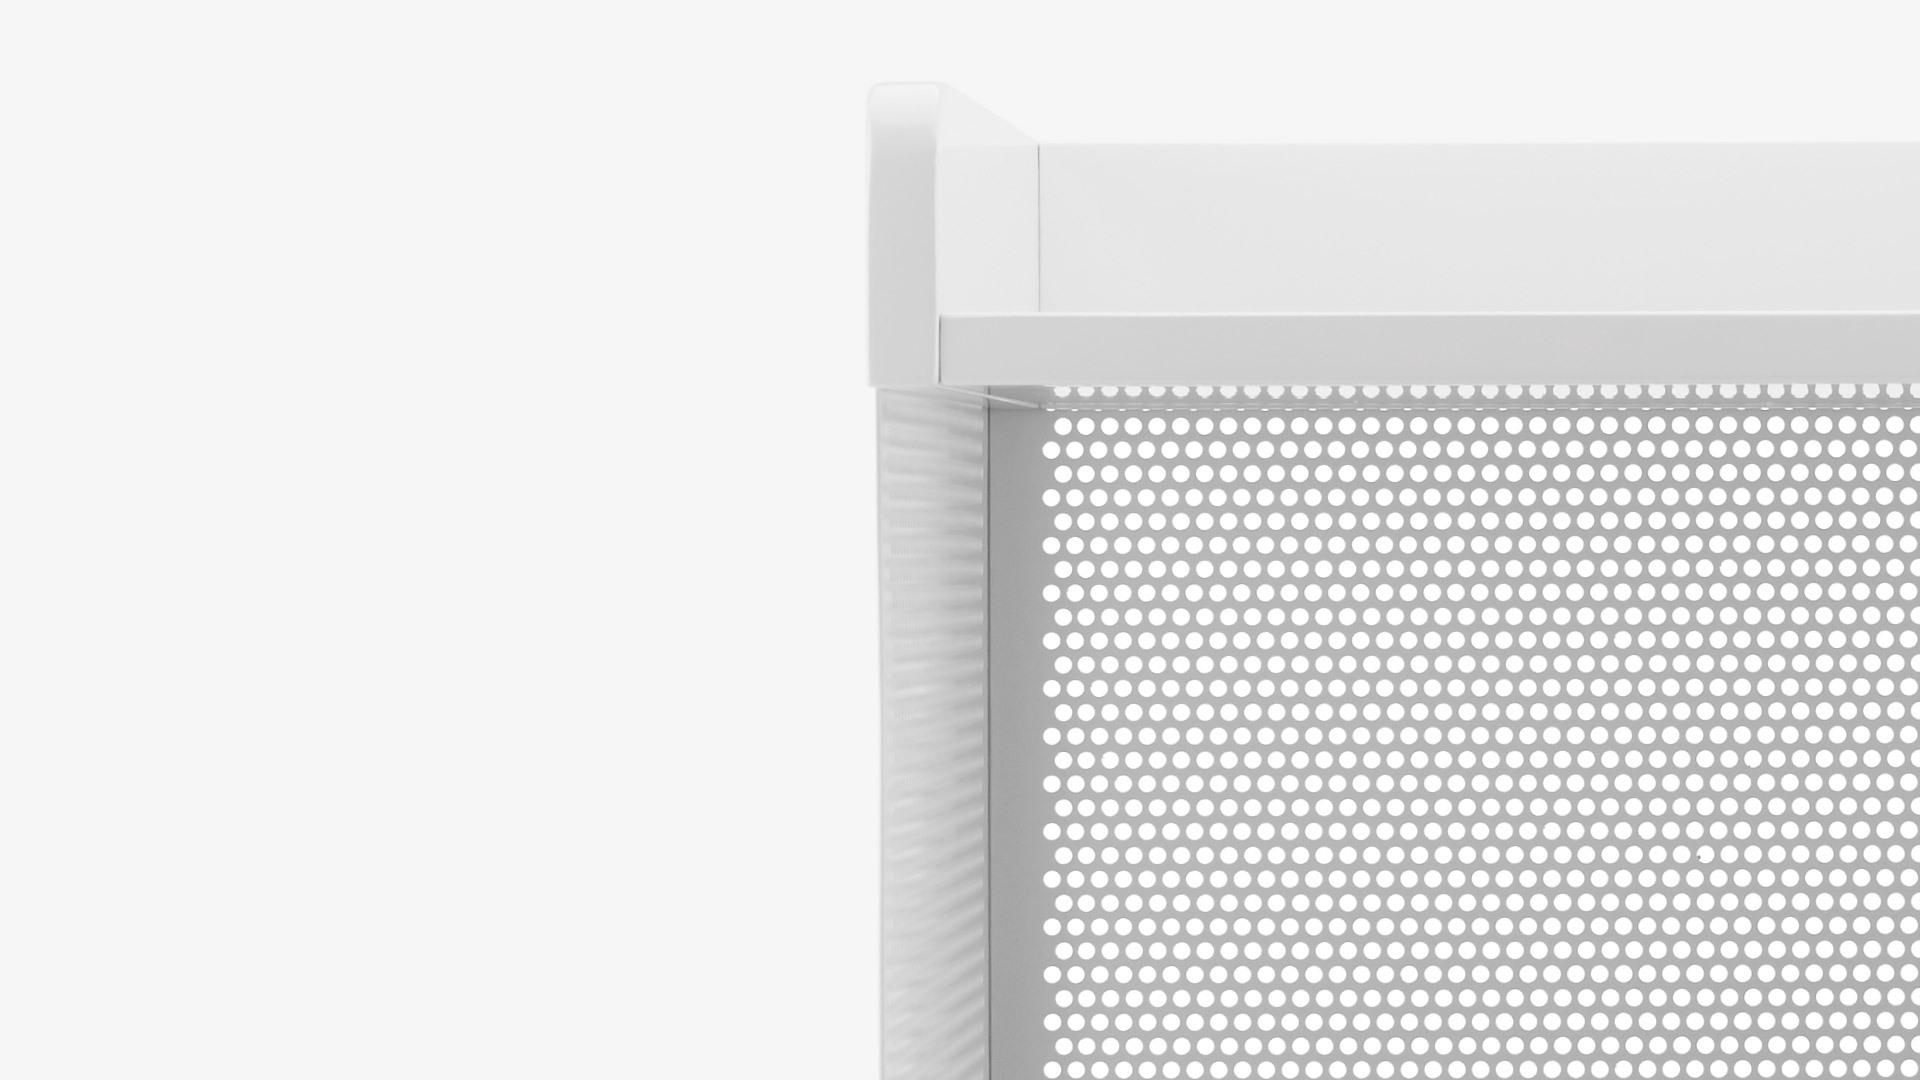 1mm公差精密定制<br/>一体折弯三面网板